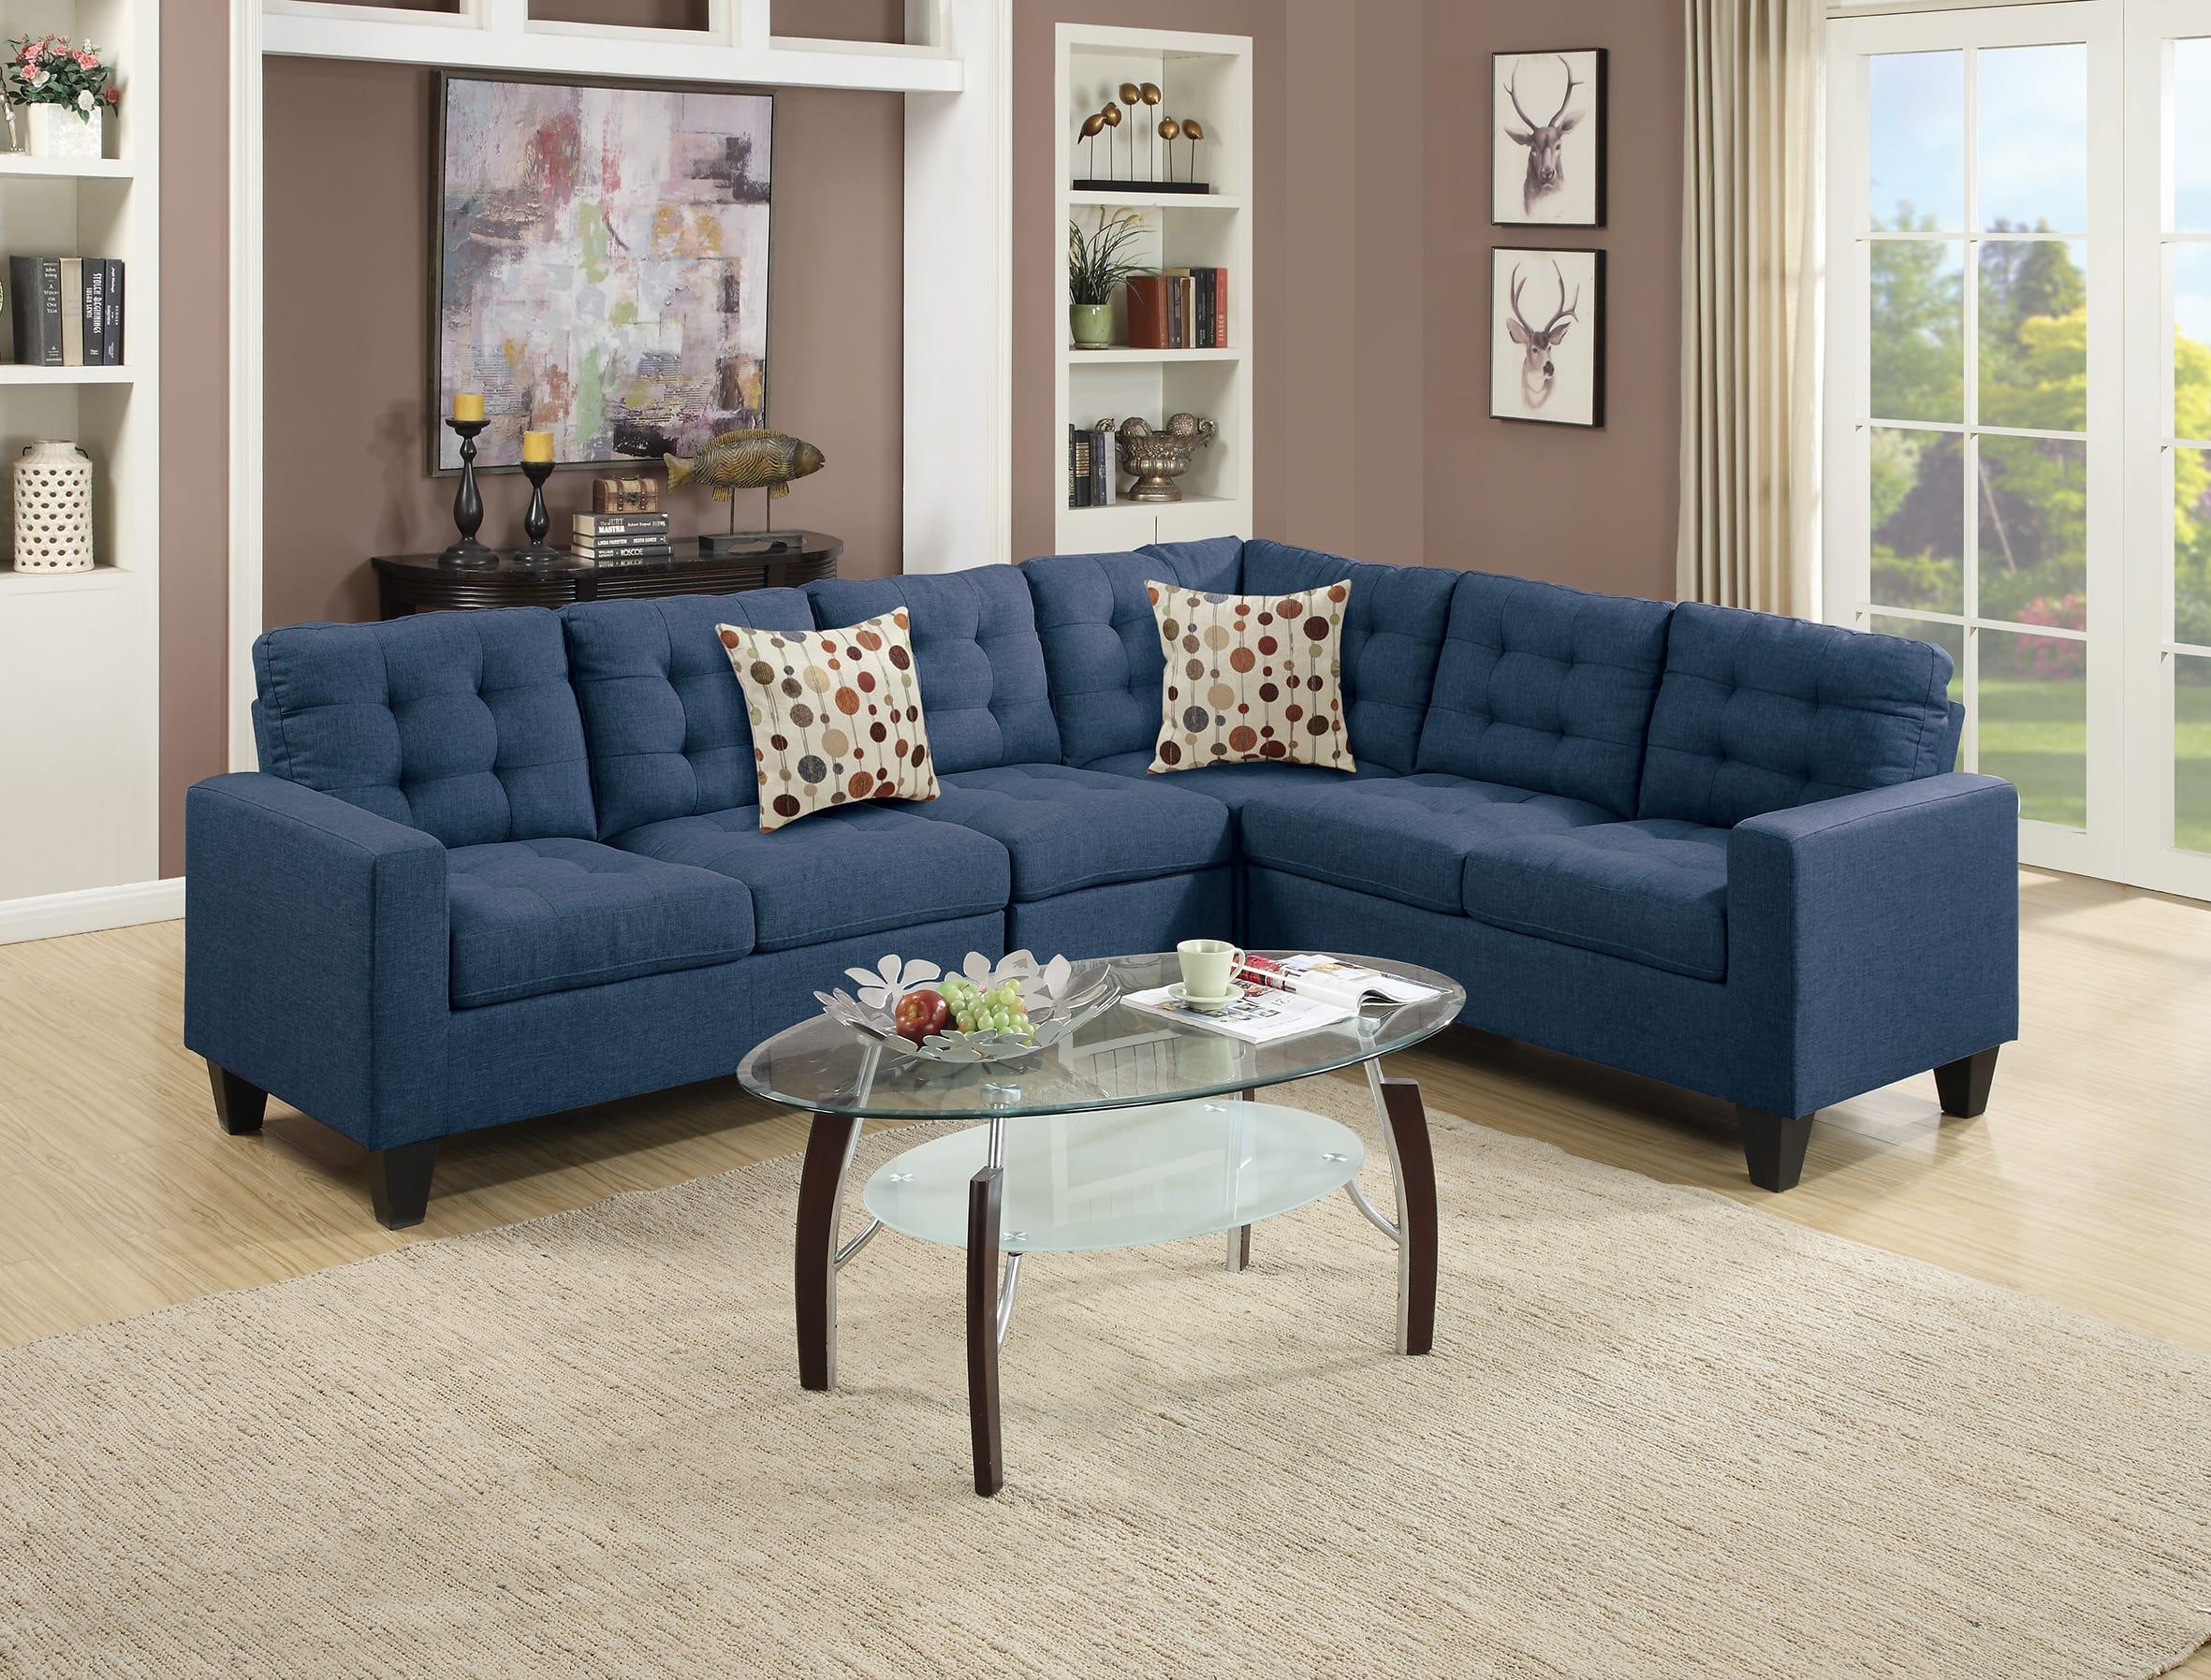 Cool F6938 Navy Blue Sectional Sofa By Poundex Inzonedesignstudio Interior Chair Design Inzonedesignstudiocom